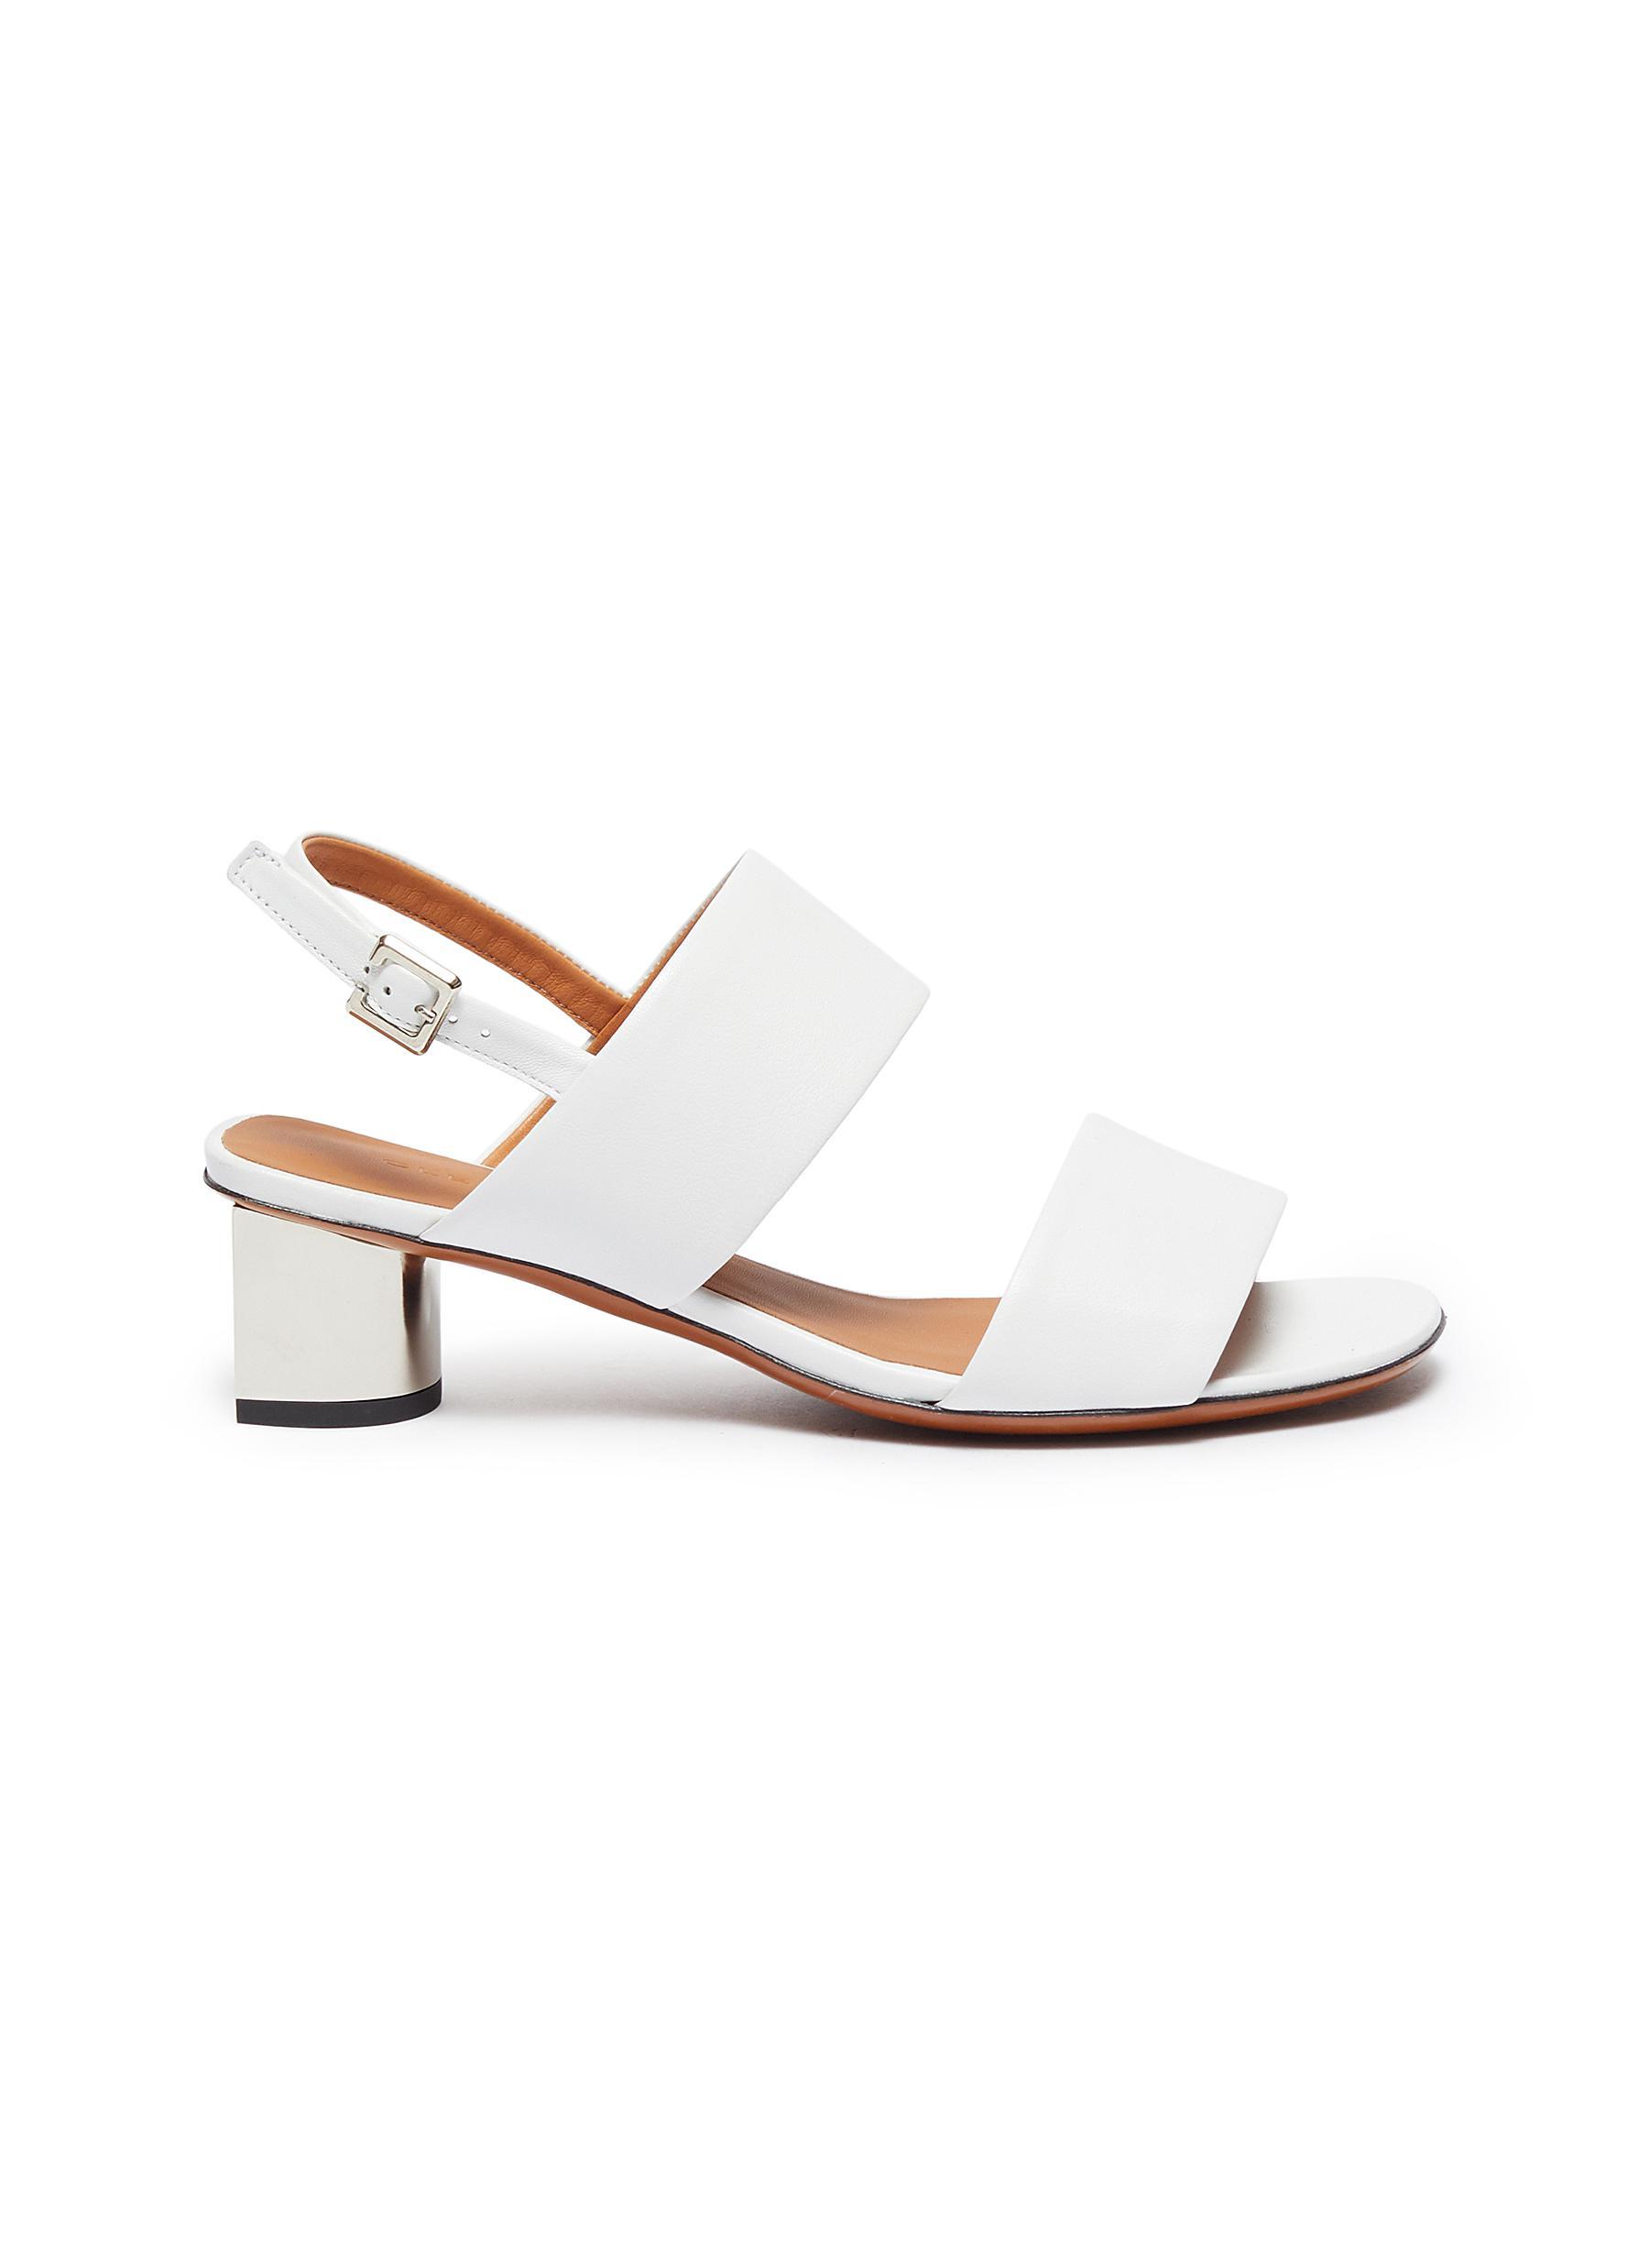 Clergerie Mid Heels Leonie metallic block heel slingback sandals